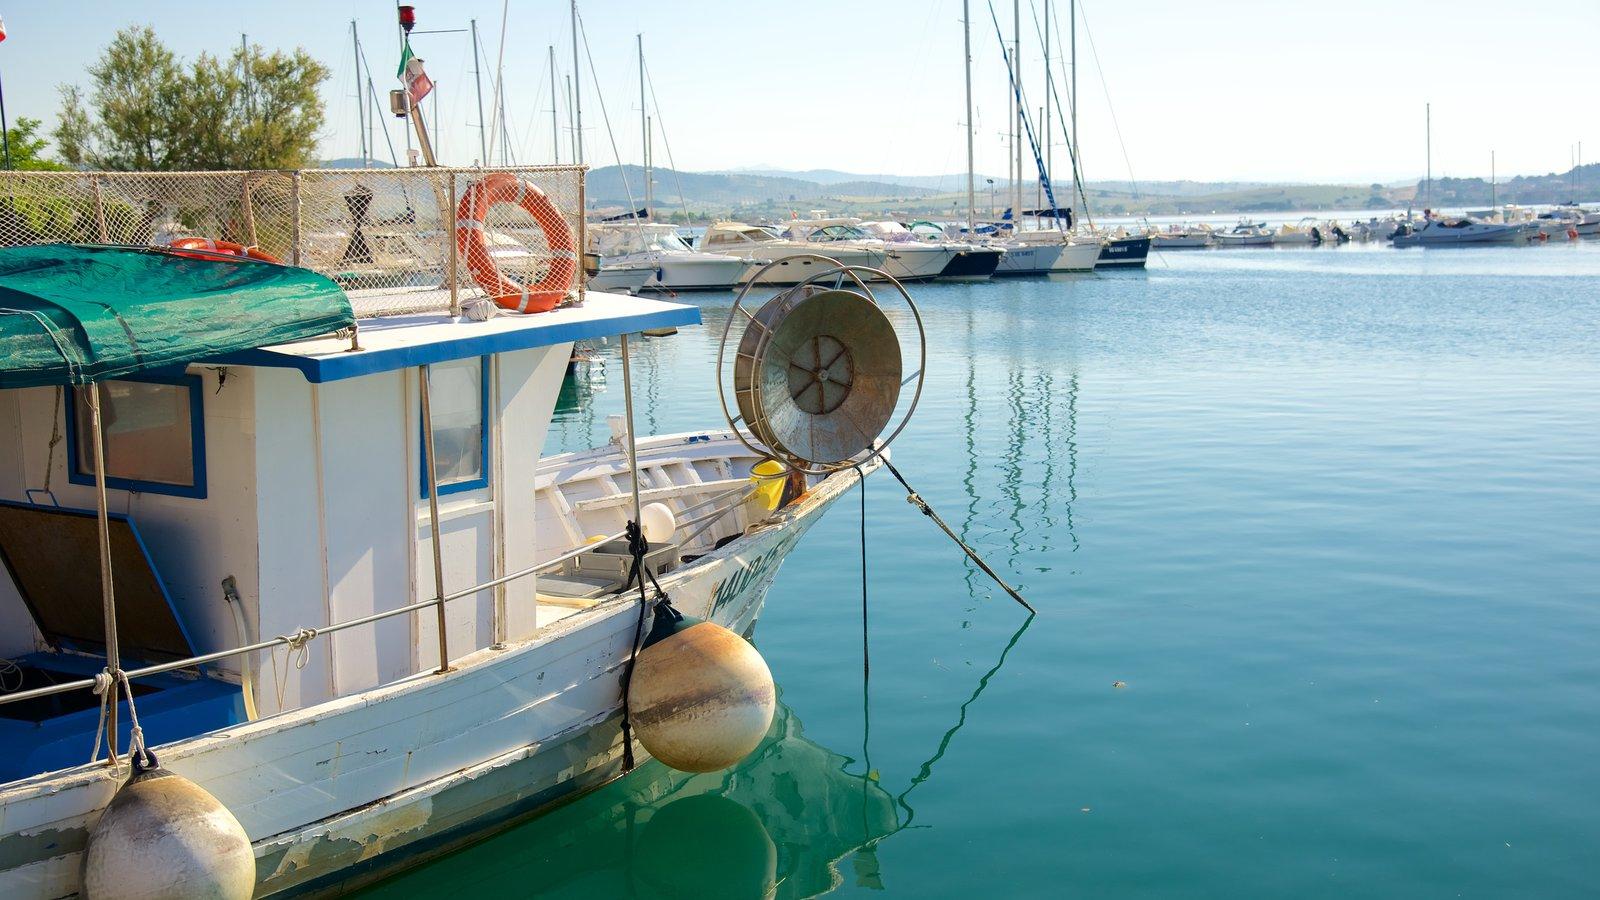 Talamone caracterizando uma marina e canoagem